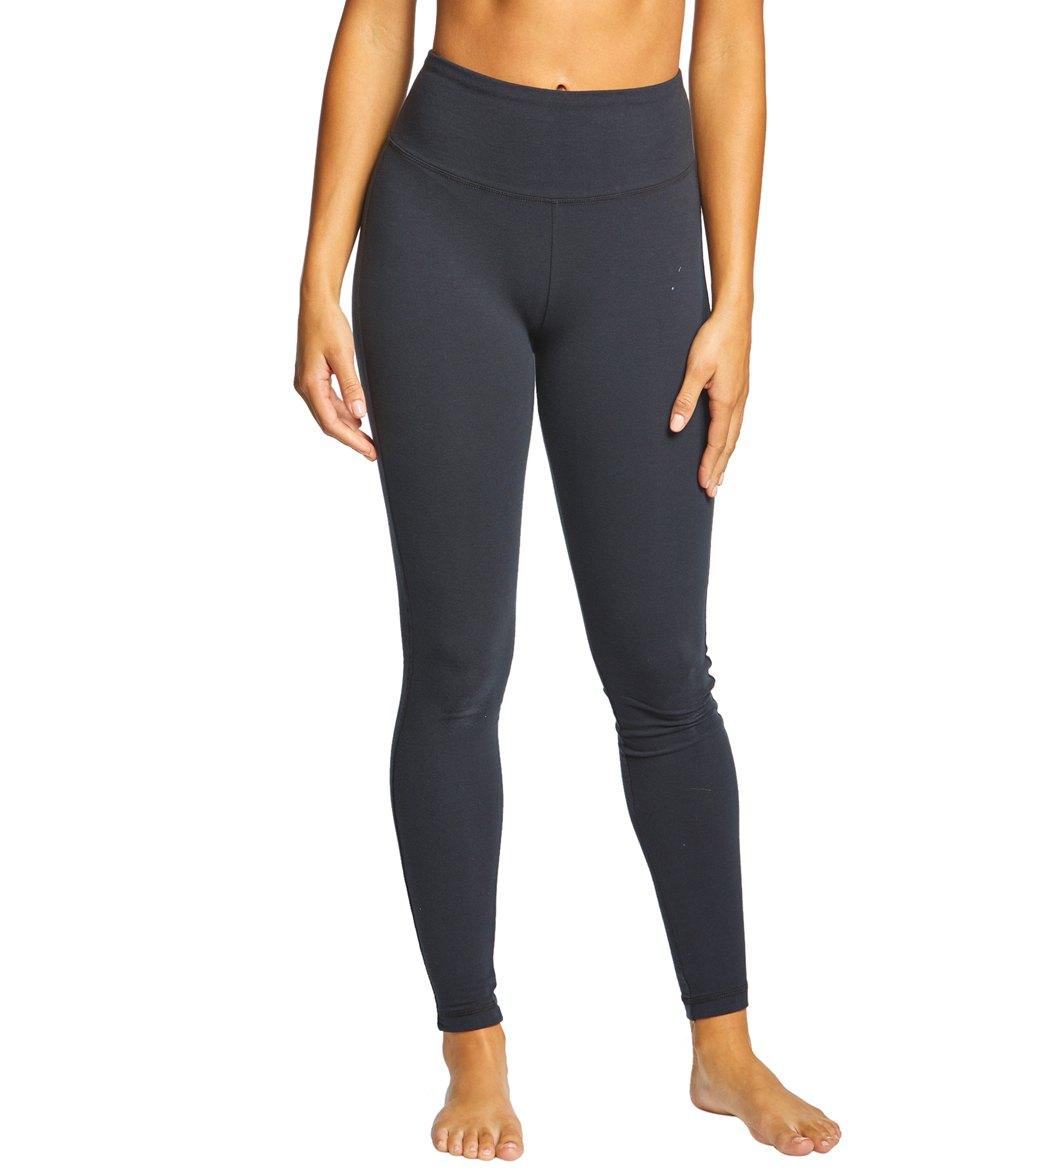 107b8fa20 Marika Tummy Control Yoga Long Leggings at YogaOutlet.com - Free ...